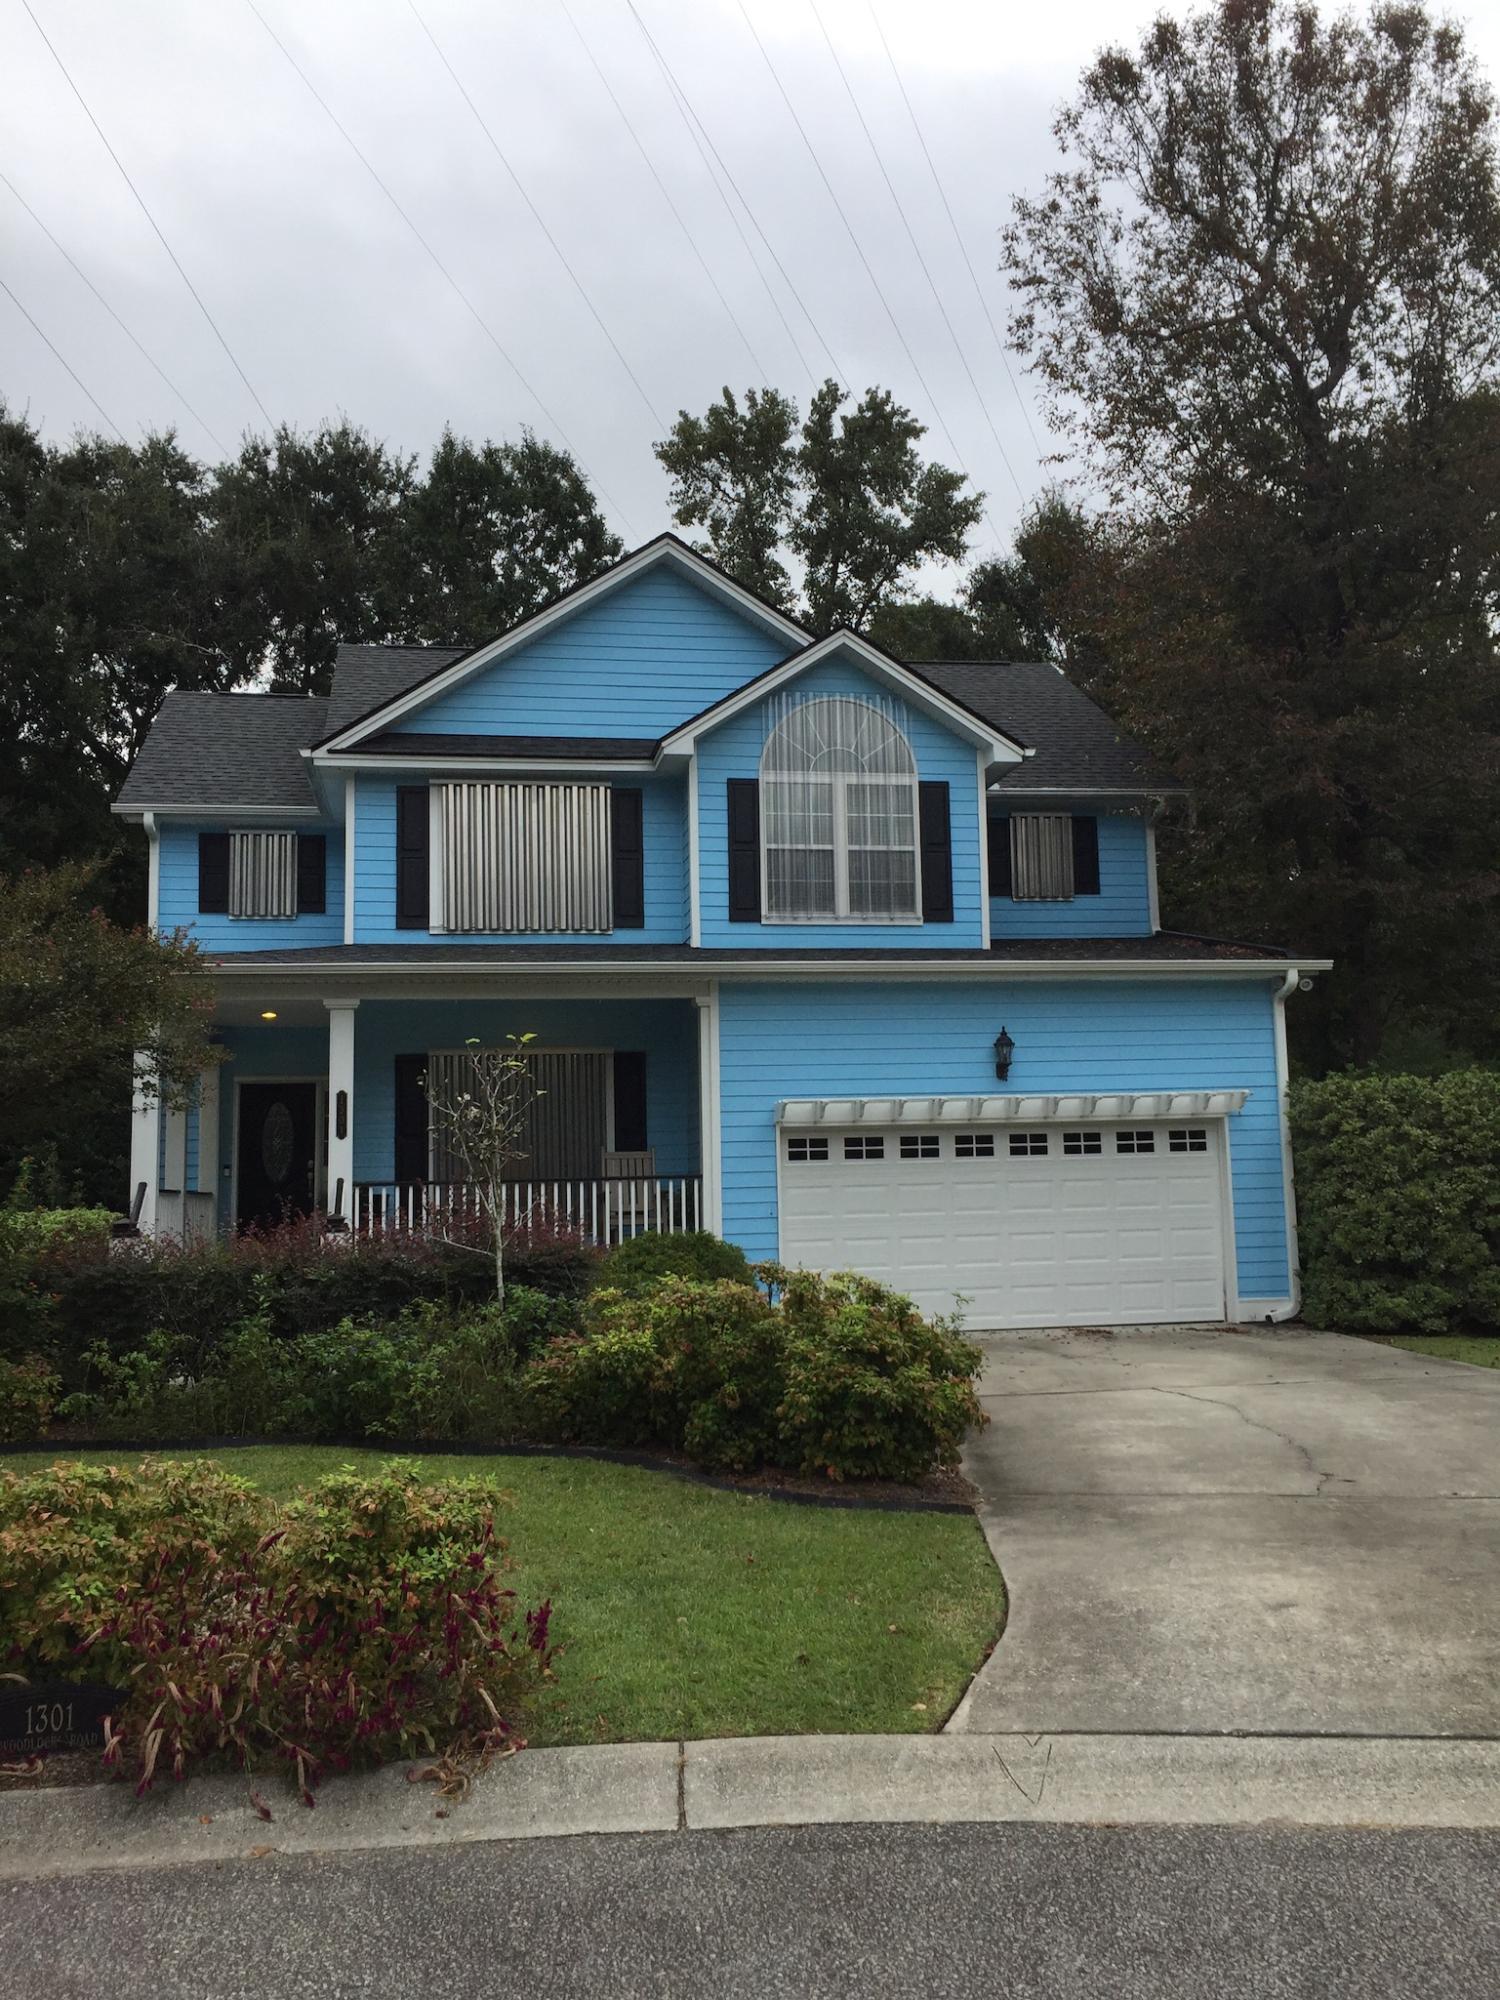 Laurel Lakes Homes For Sale - 1301 Woodlock, Mount Pleasant, SC - 0